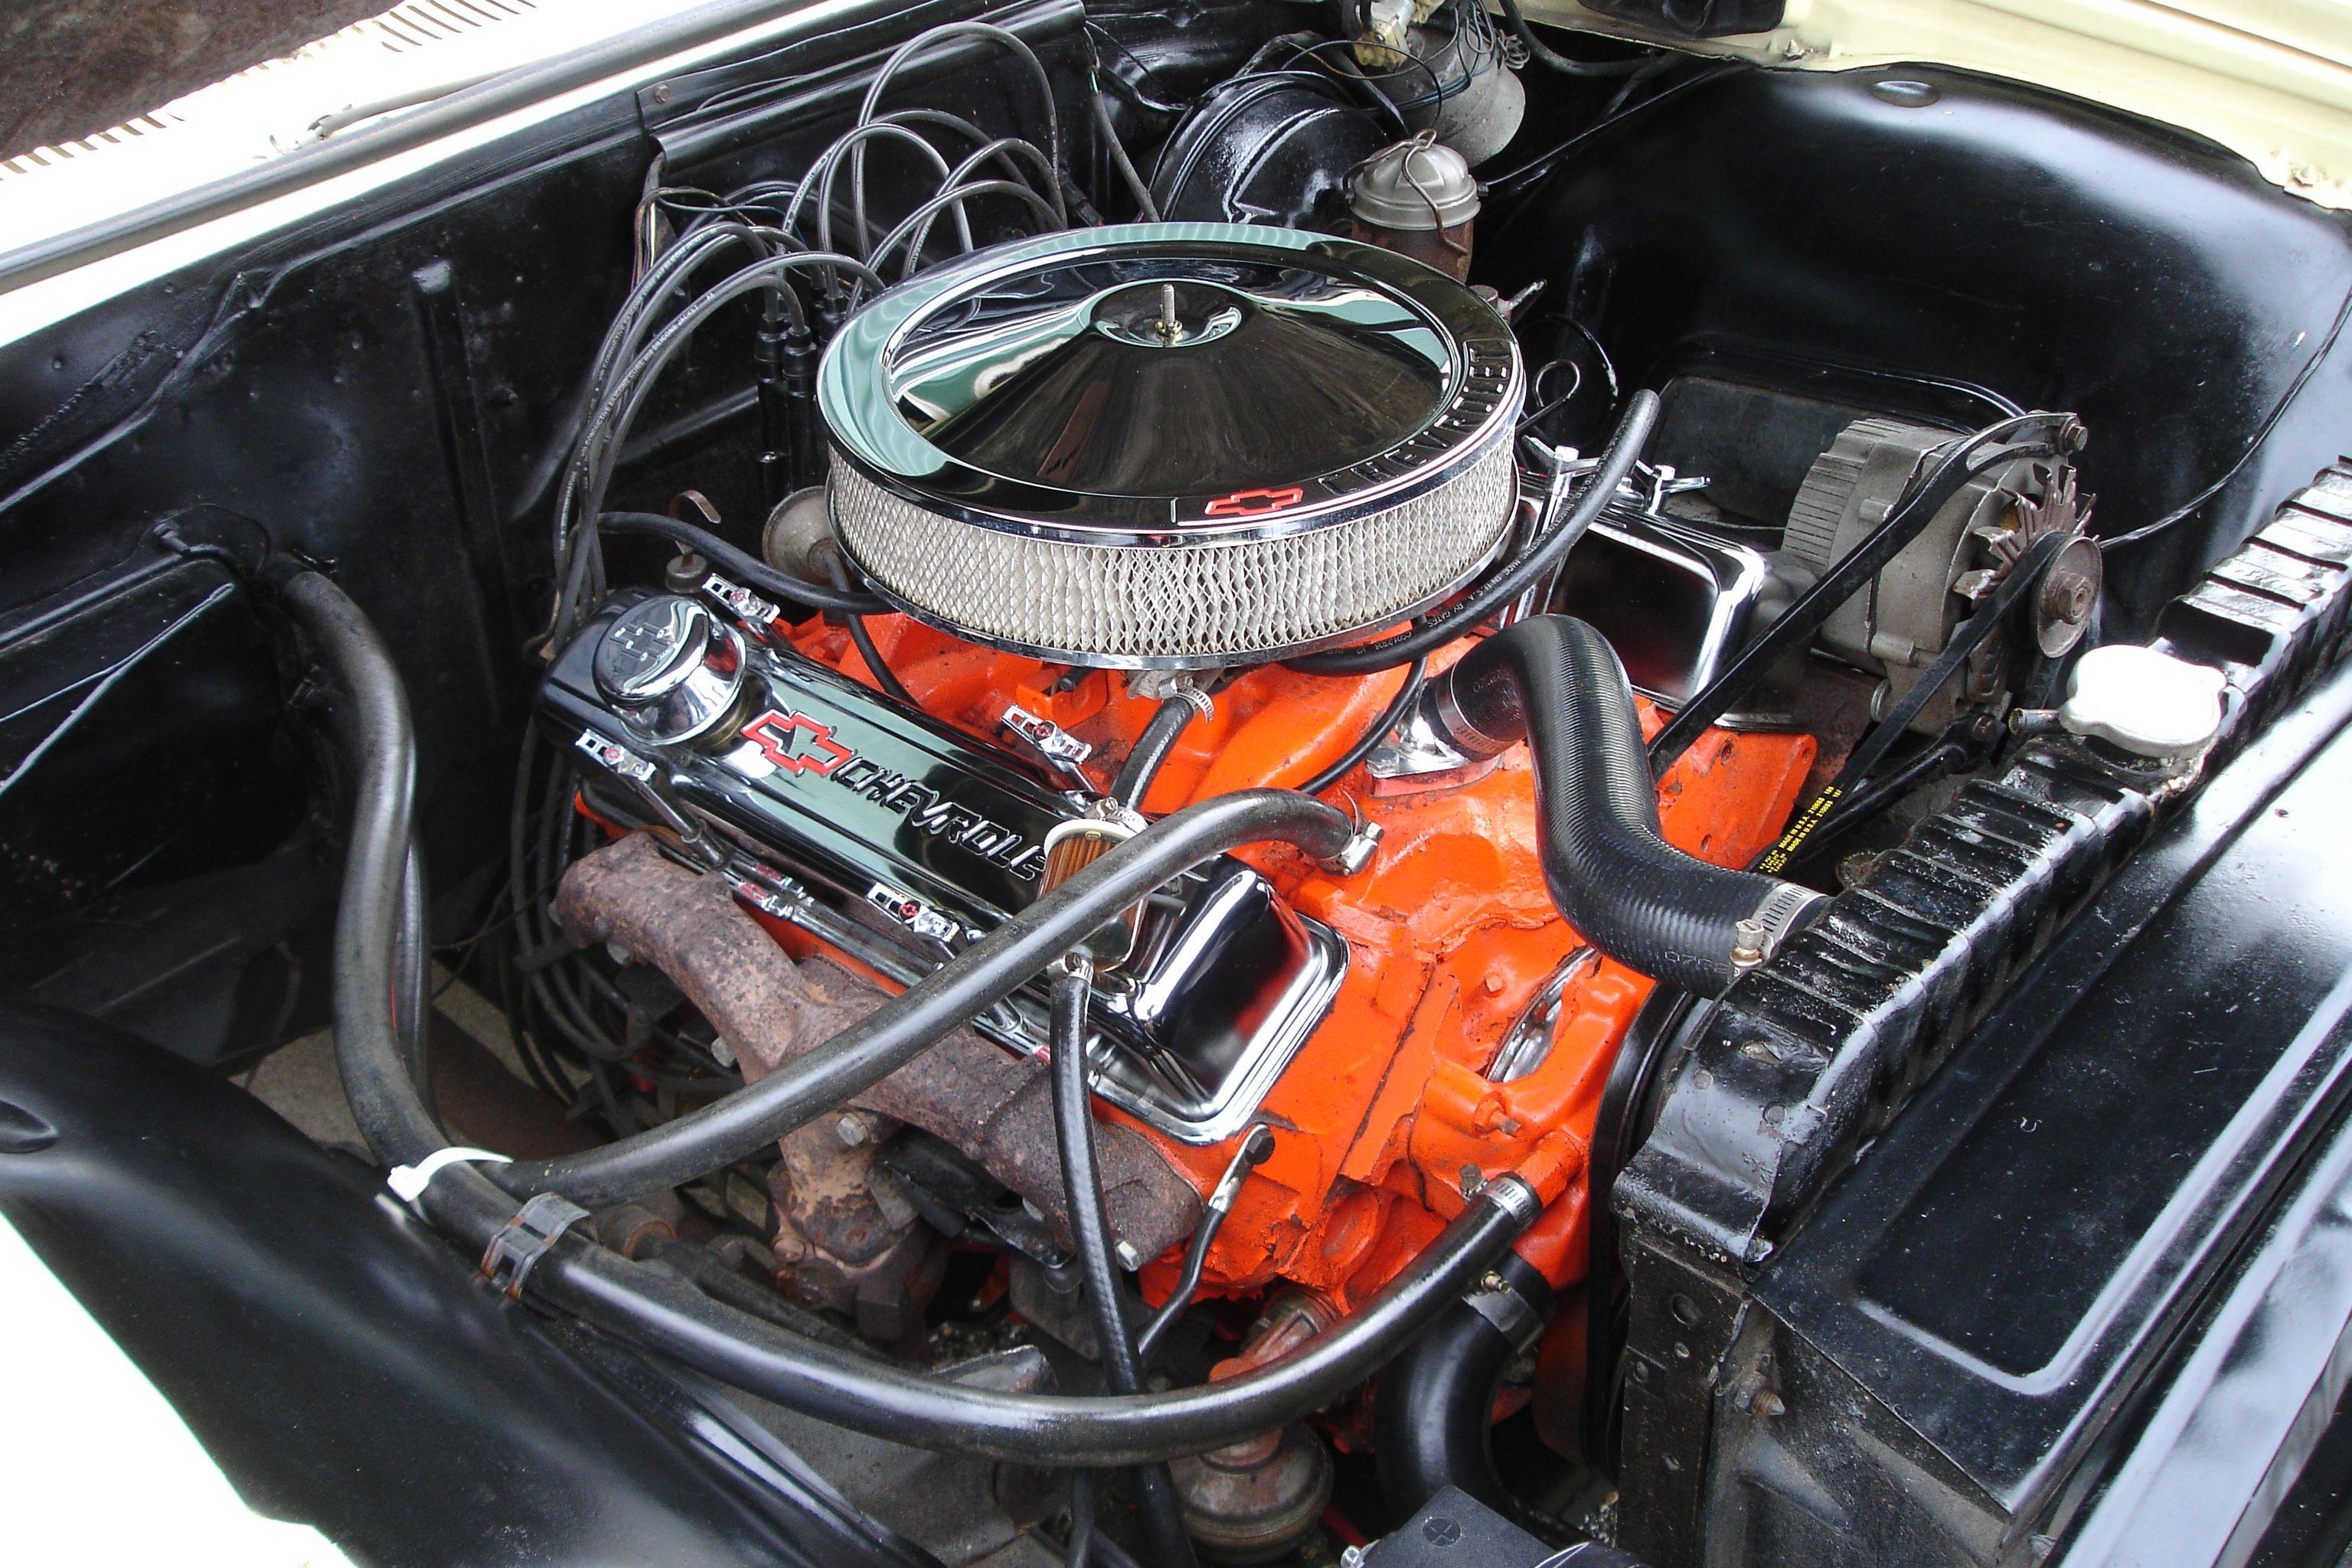 350 Sbc Engine Prior To Upgrades Chevrolet Impala Dream Cars Impala